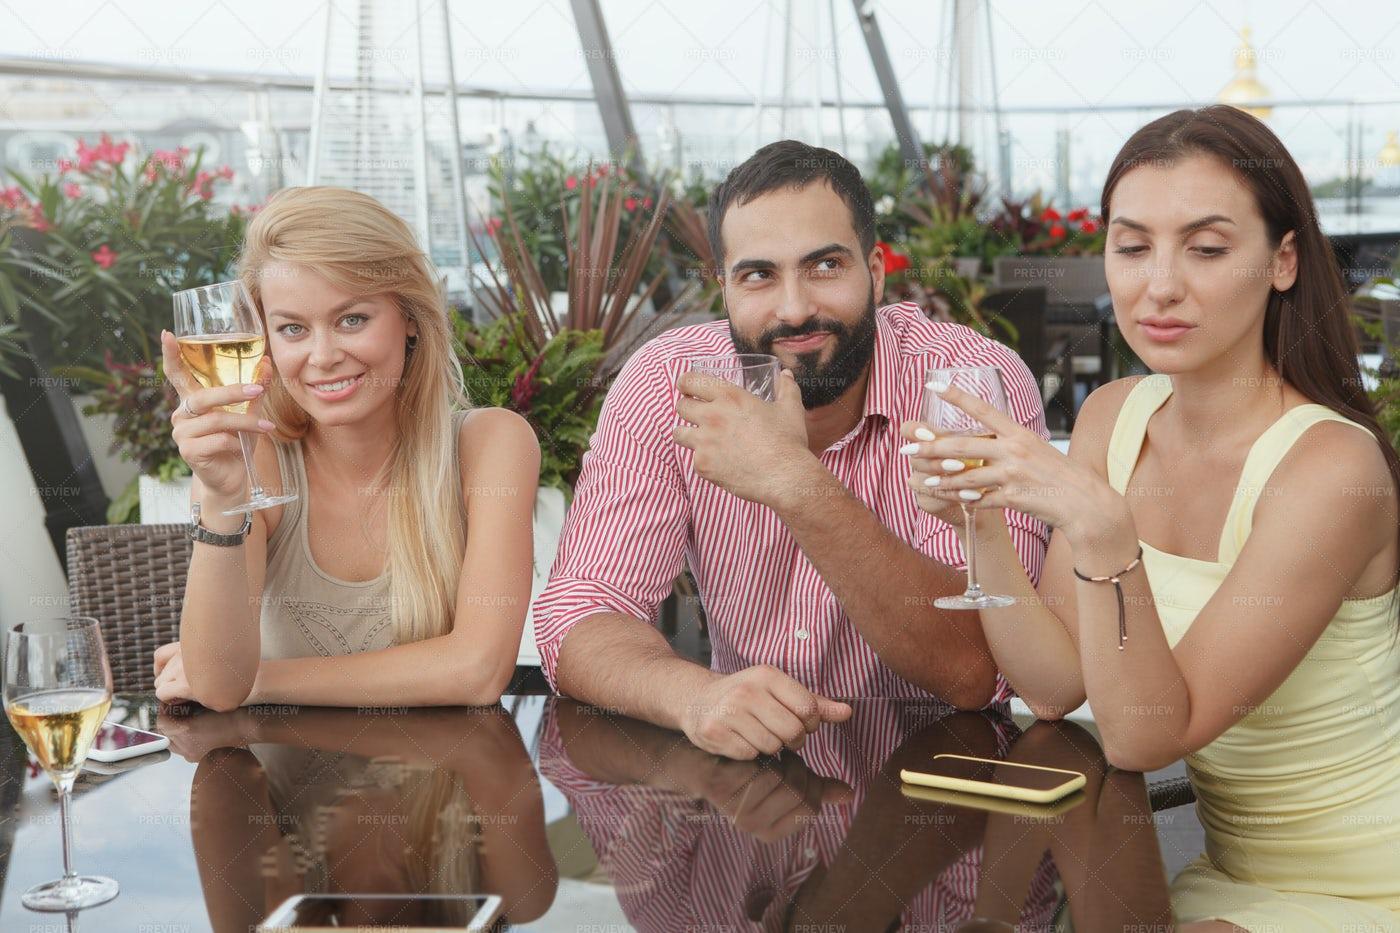 Friends Enjoying Drinks At The Bar: Stock Photos